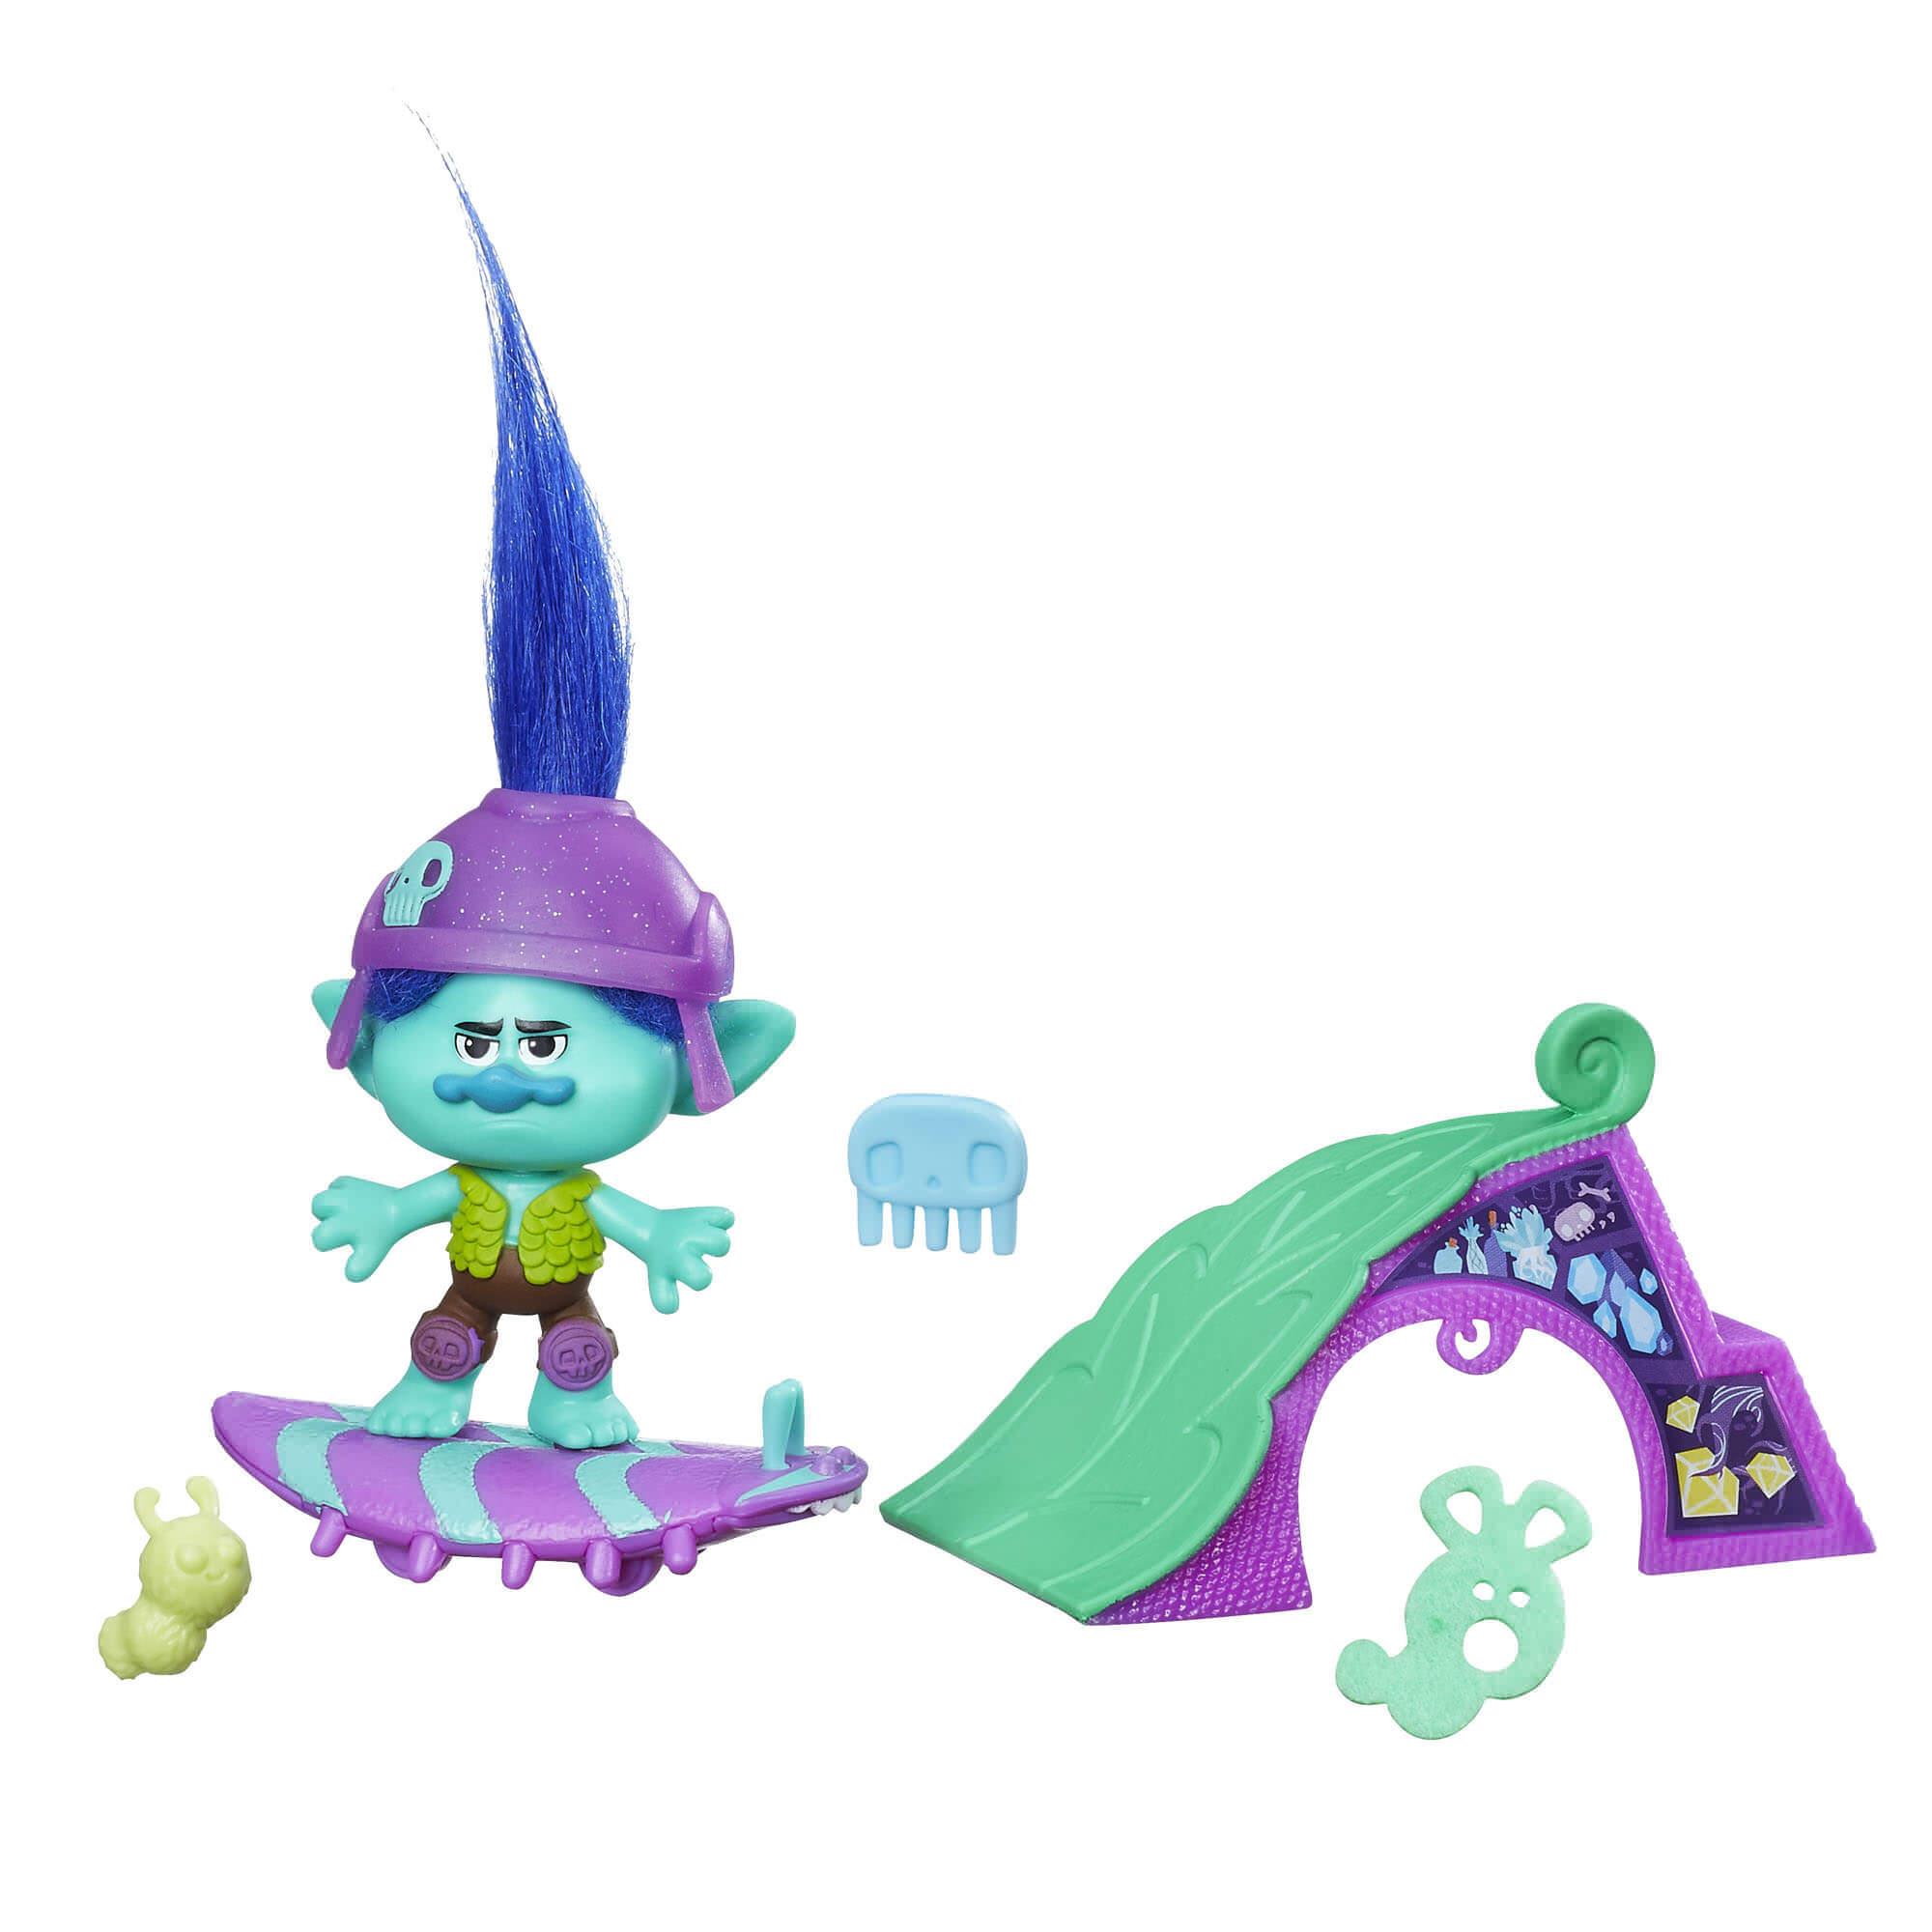 Boneco Trolls Tronco E Seu Skate B6556 Hasbro